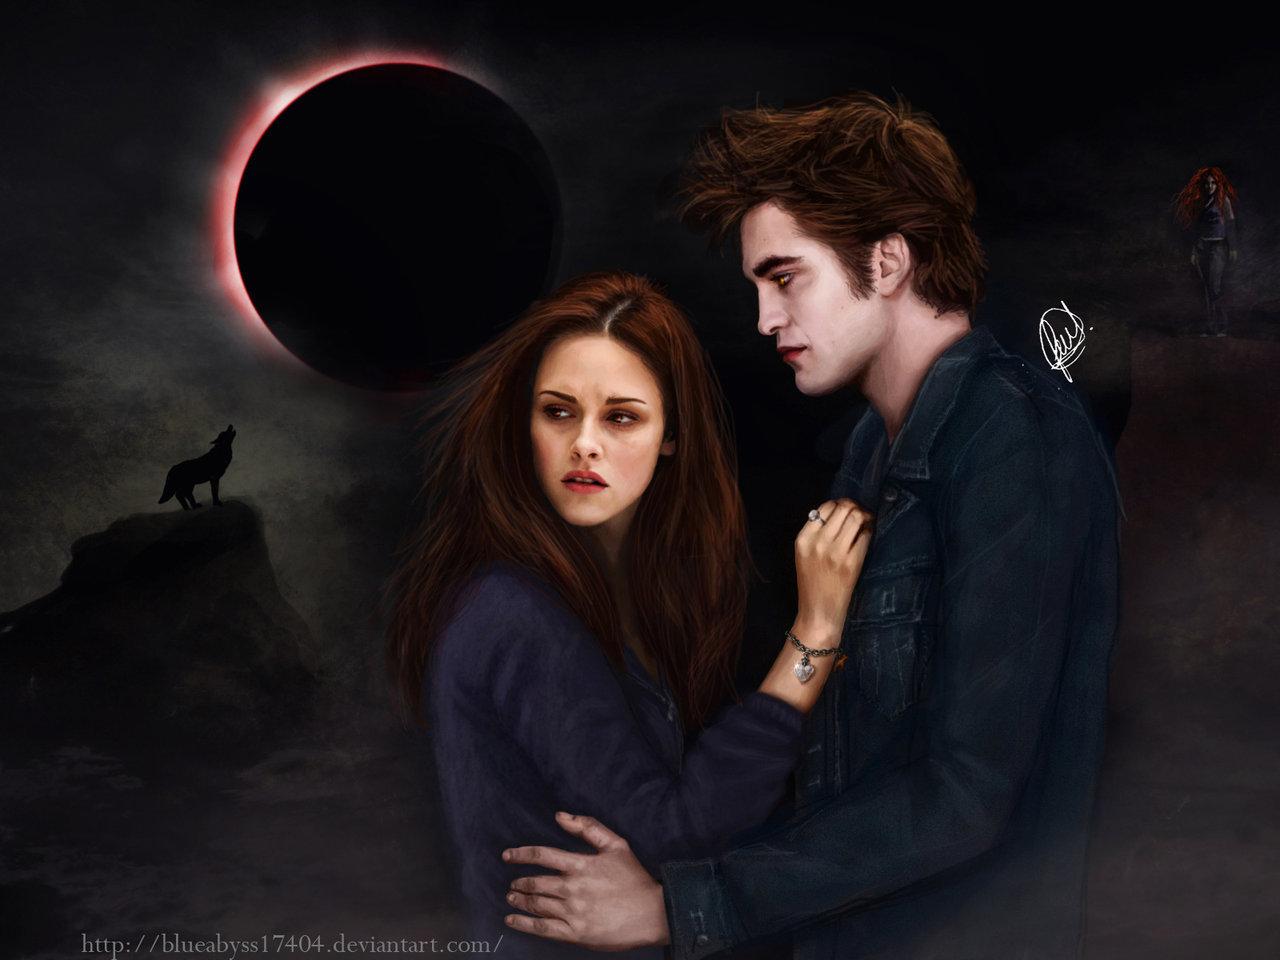 Eclipse fanmade   The Twilight saga Eclipse Wallpaper 16914306 1280x960